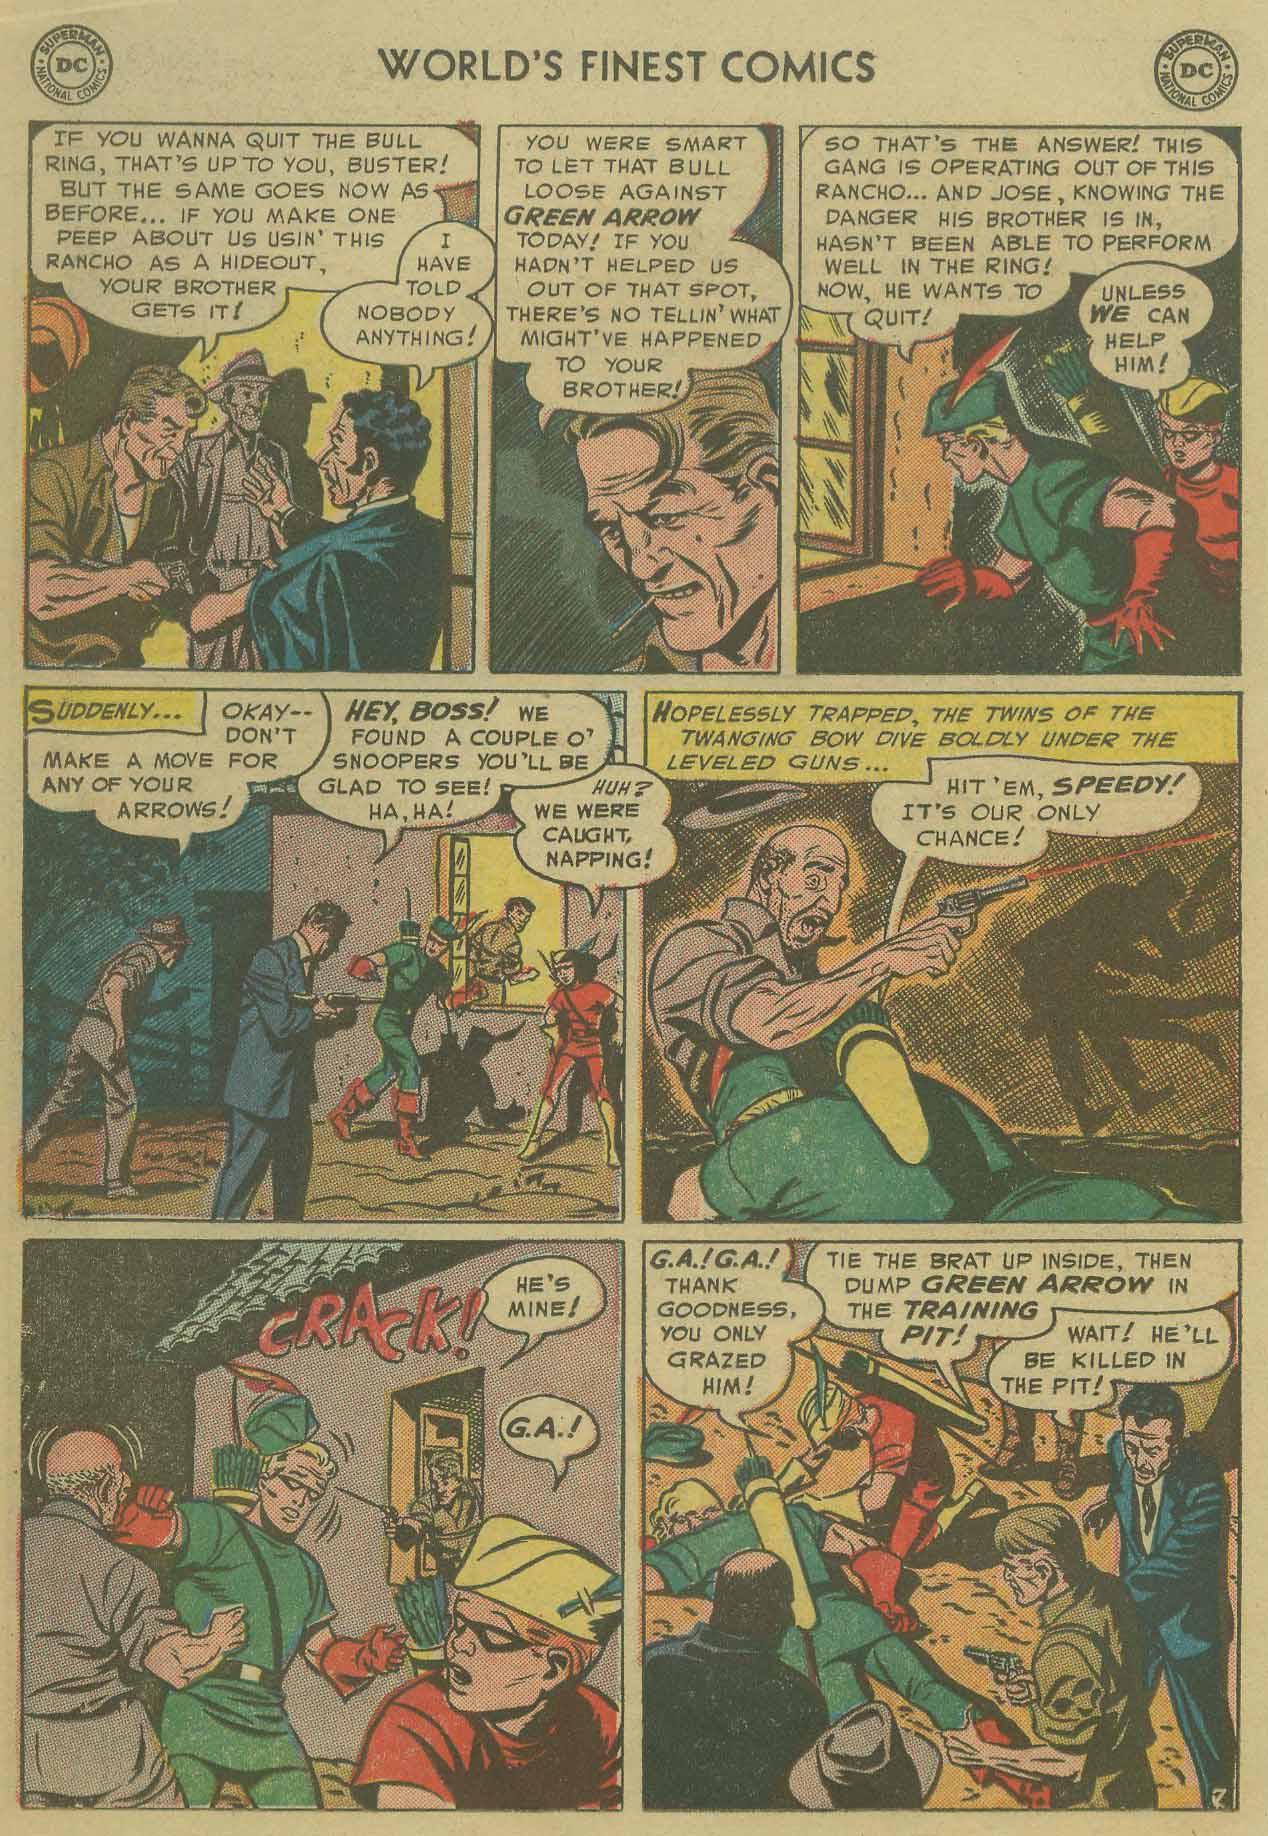 Read online World's Finest Comics comic -  Issue #69 - 34